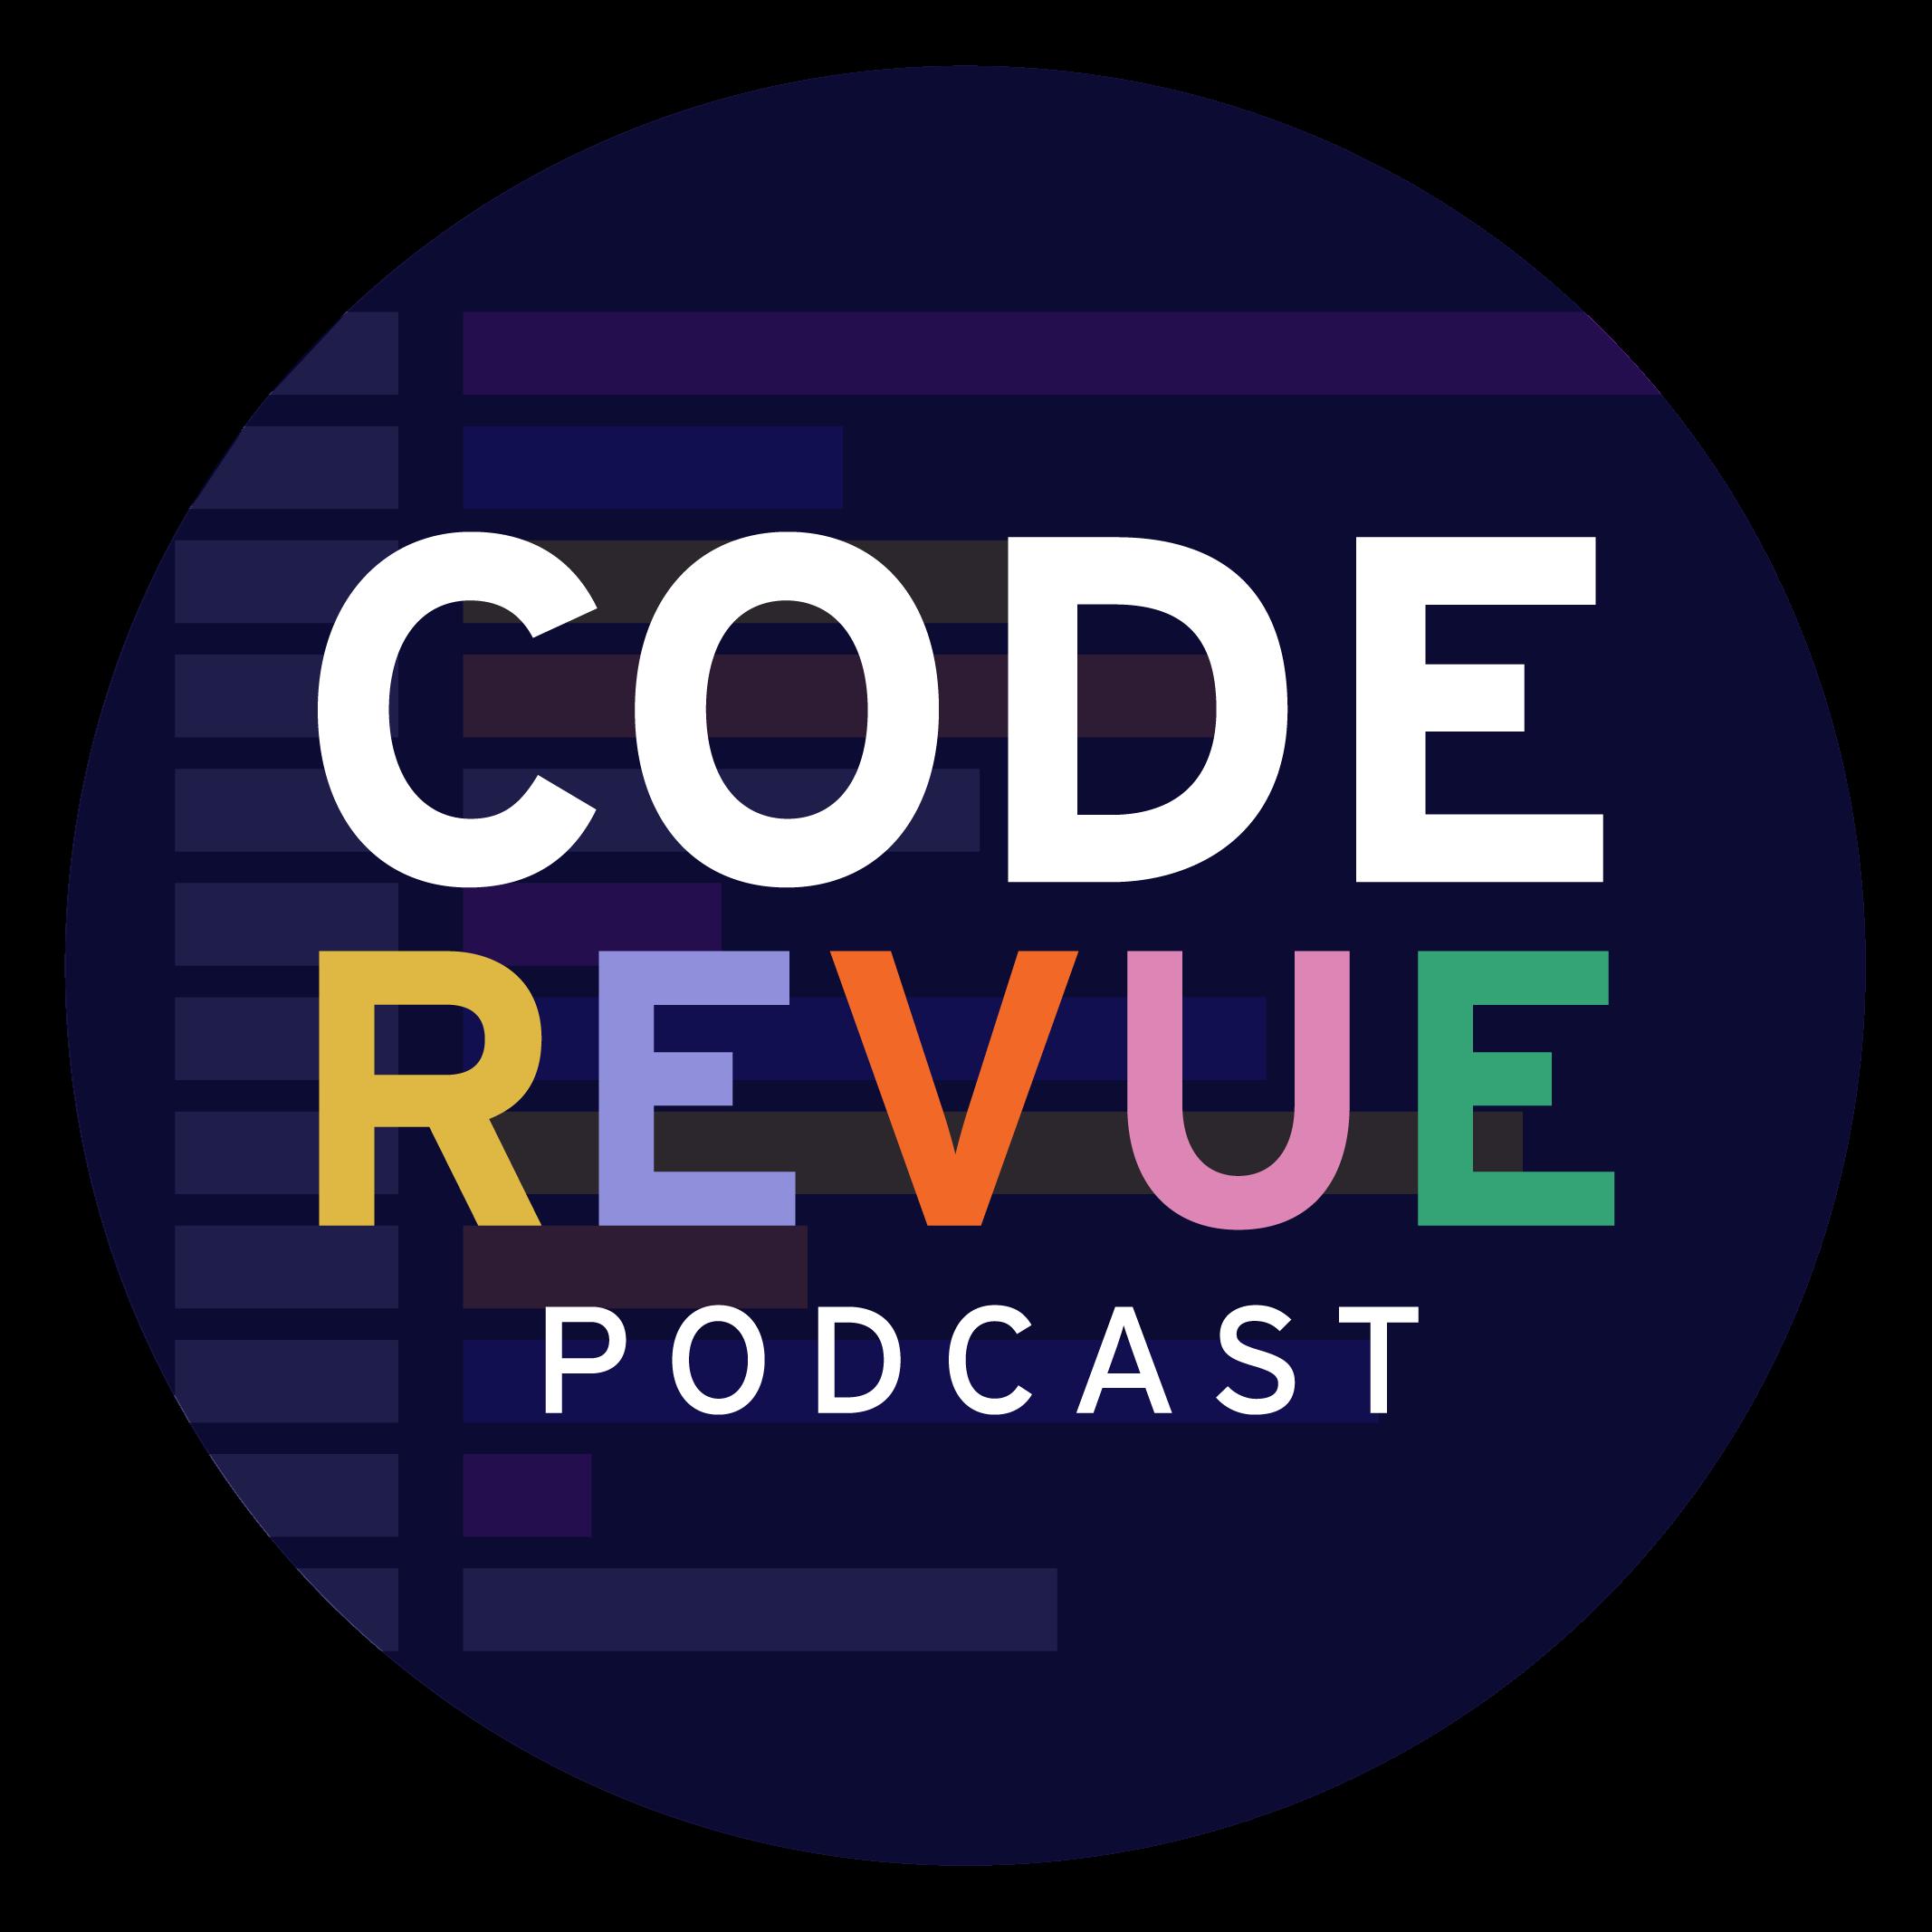 Code Revue Podcast